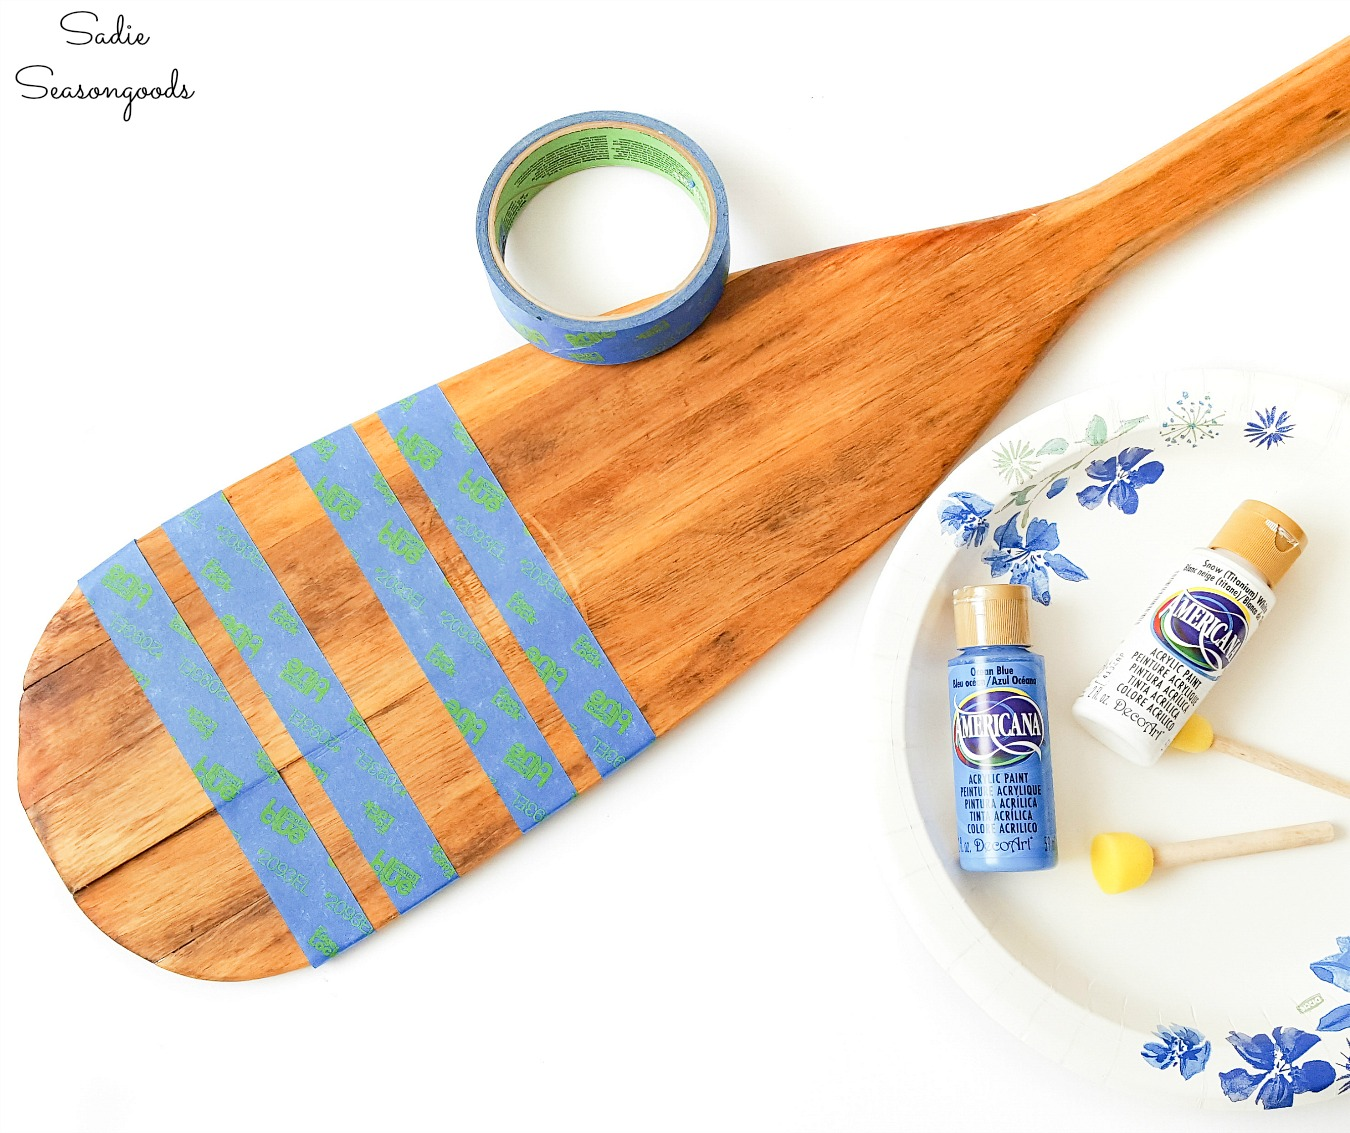 Painting stripes on a row boat oar